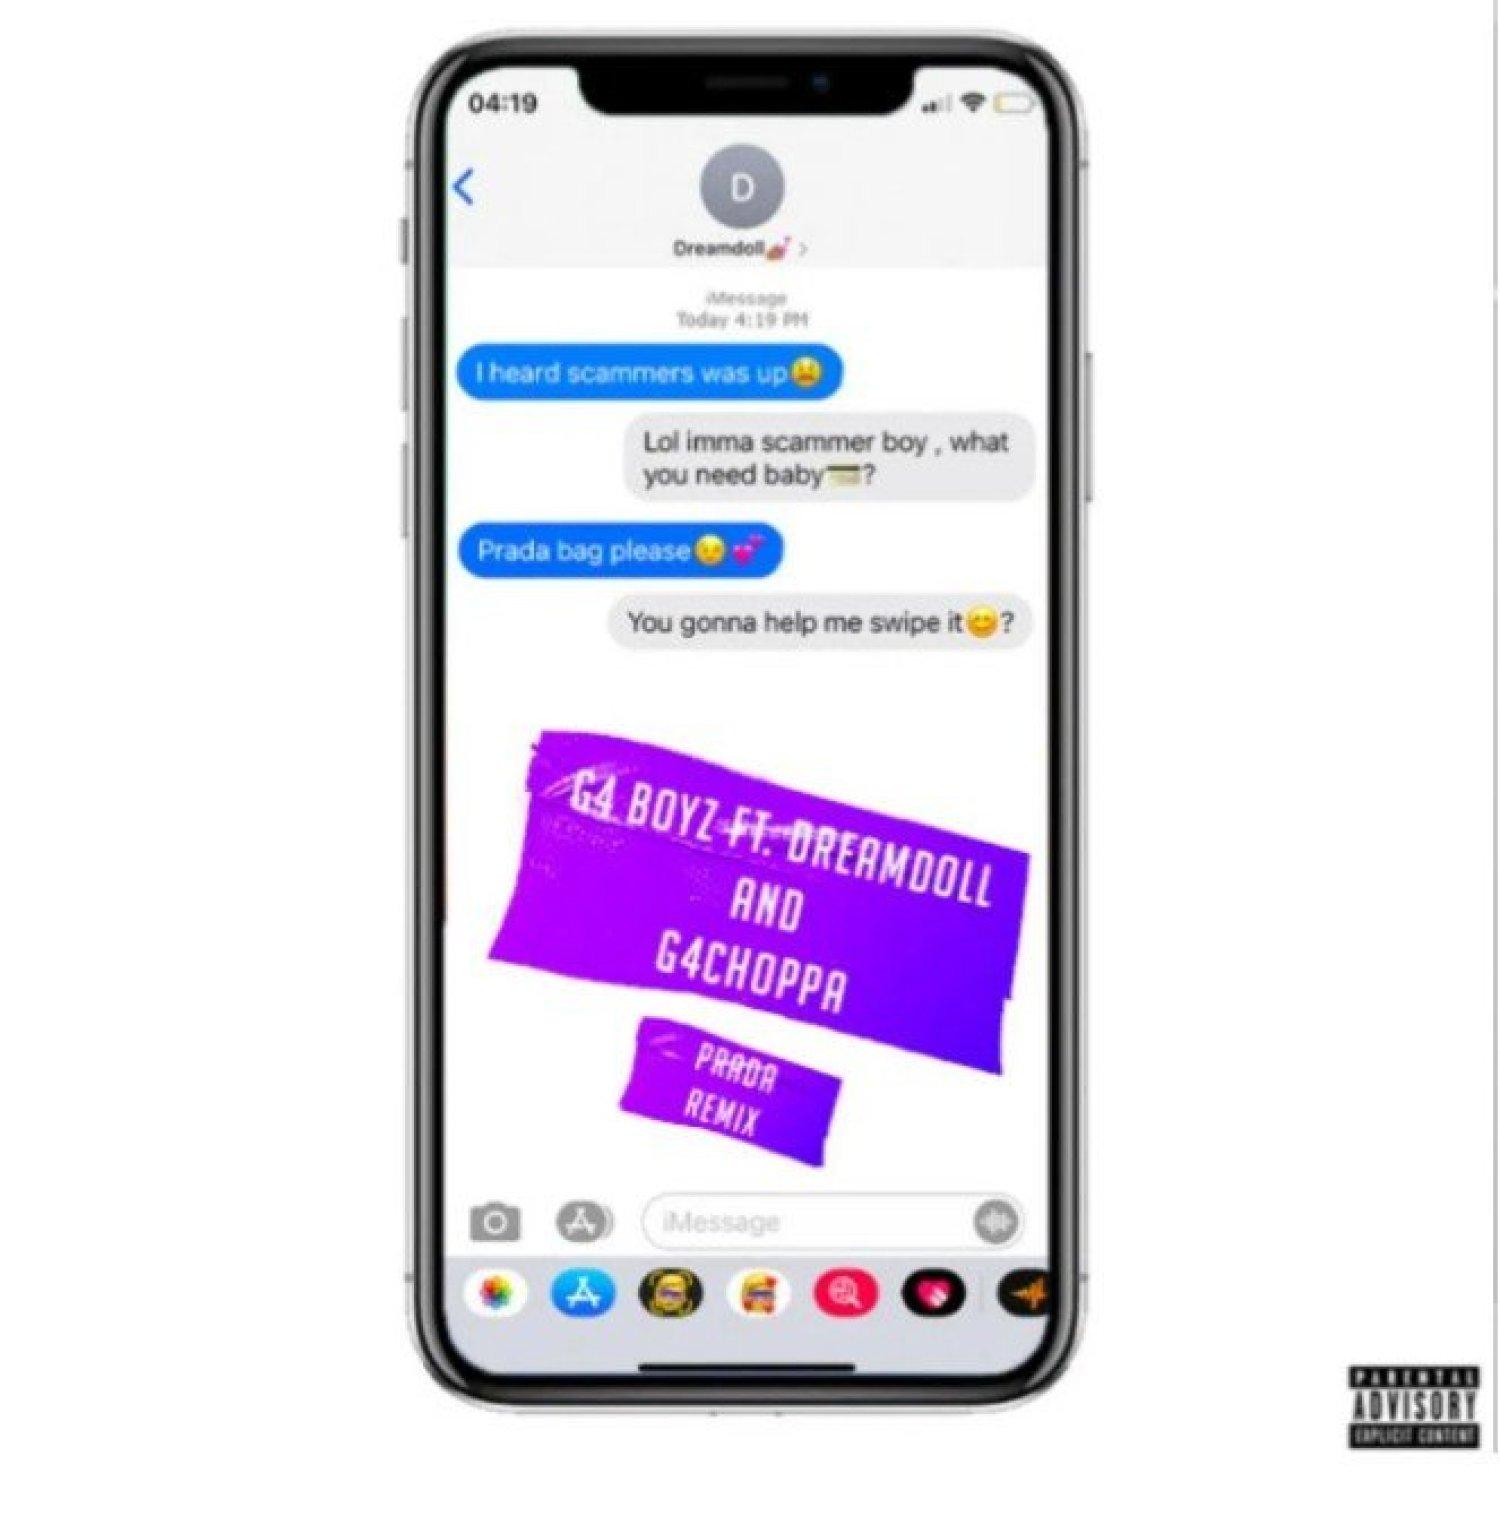 DOWNLOAD MP3: G4 Boyz Ft. Dreamdoll & G4Choppa – Prada (Remix)